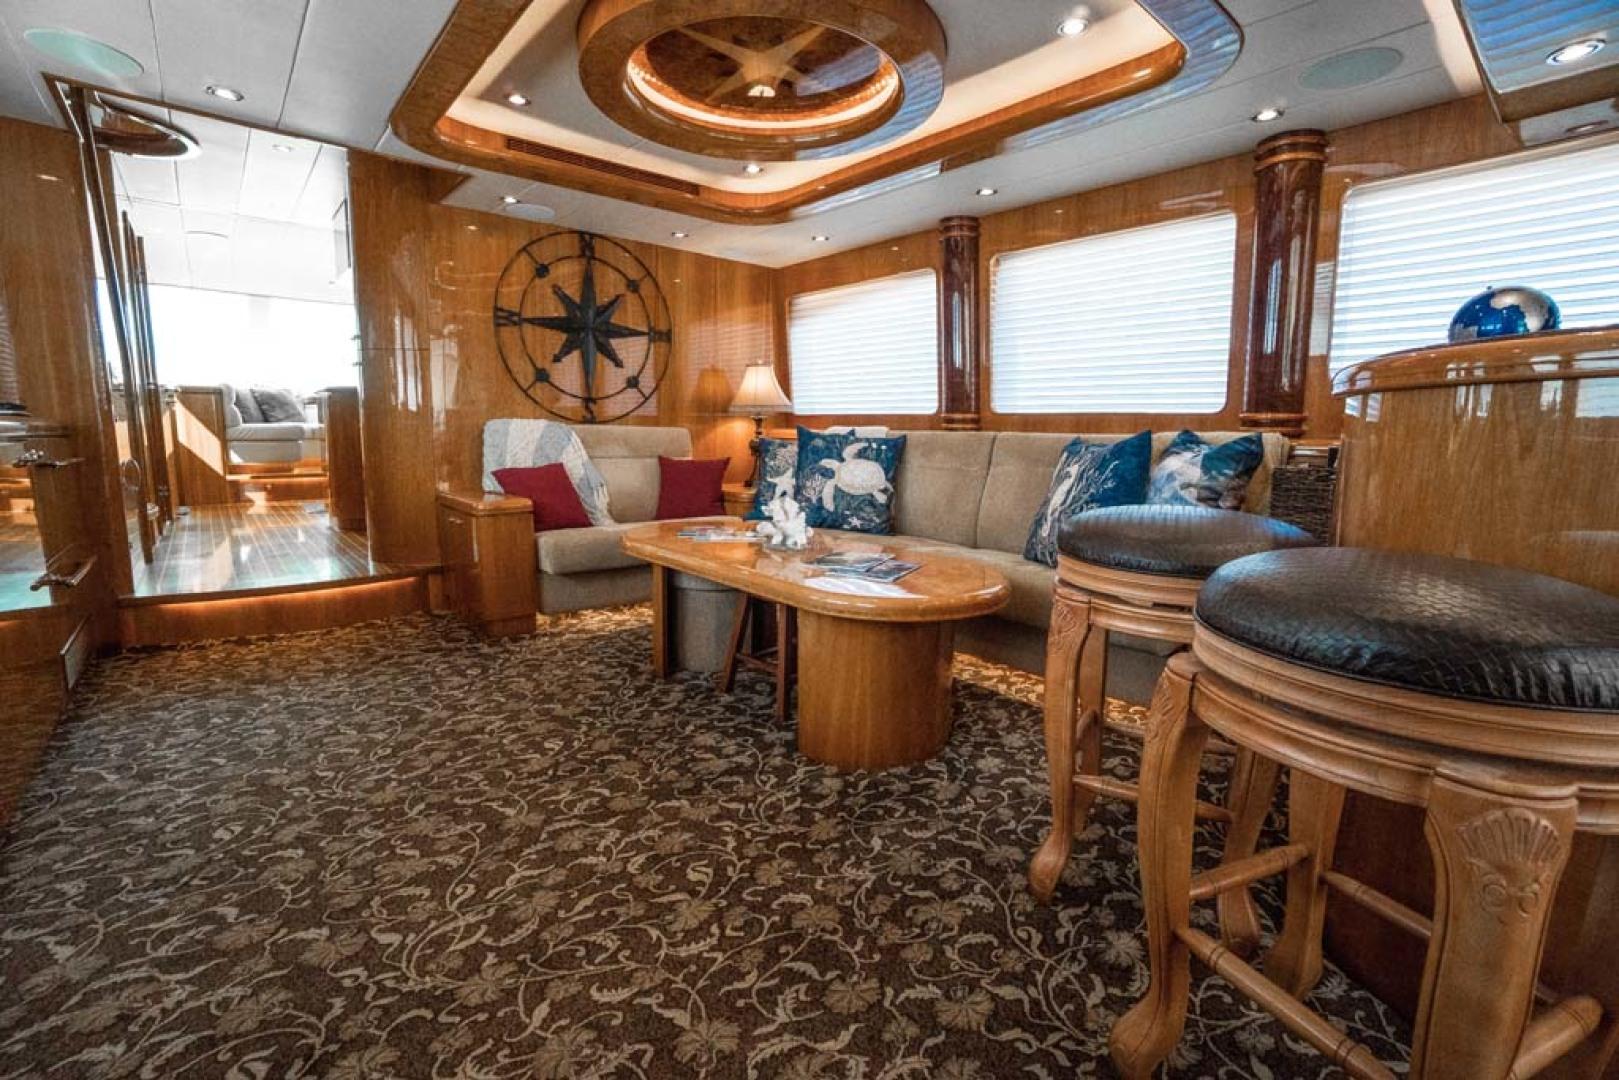 Horizon-Cockpit-Motor-Yacht-2008-Liberation-Stuart-Florida-United-States-Main-Salon-1075319